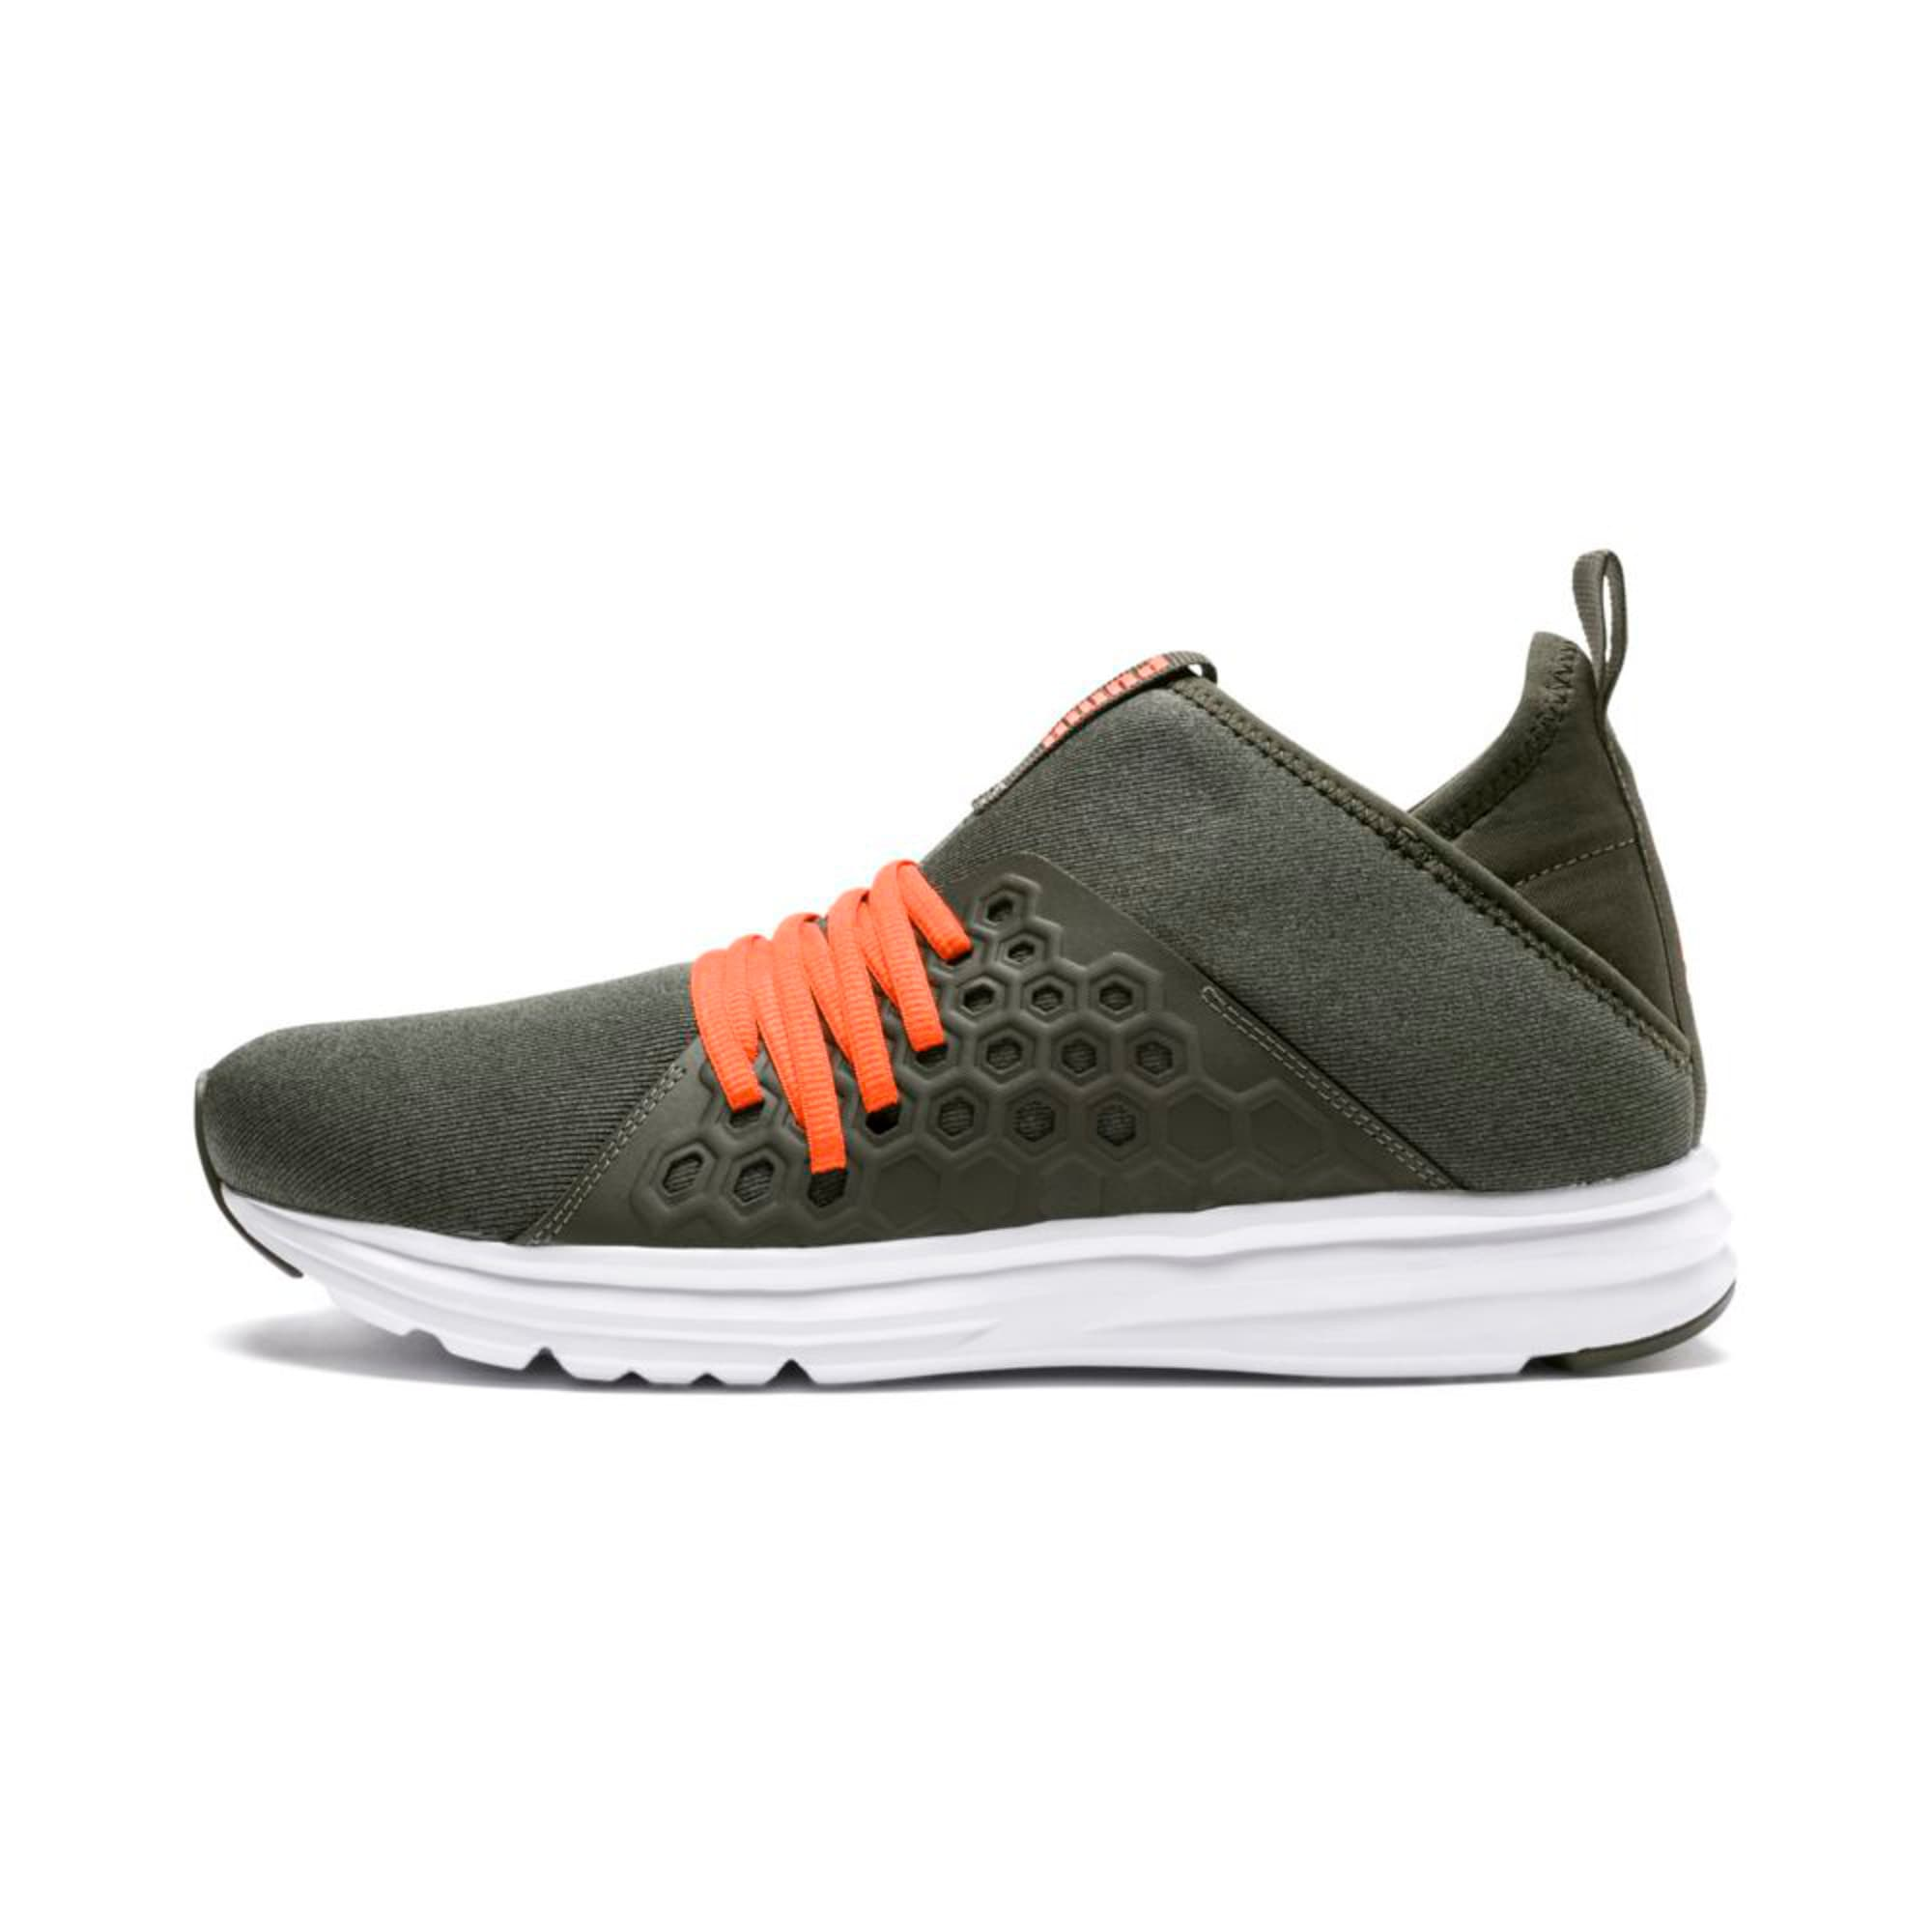 Thumbnail 1 of Enzo NETFIT Mid Men's Training Shoes, Forest Night-Firecracker, medium-IND